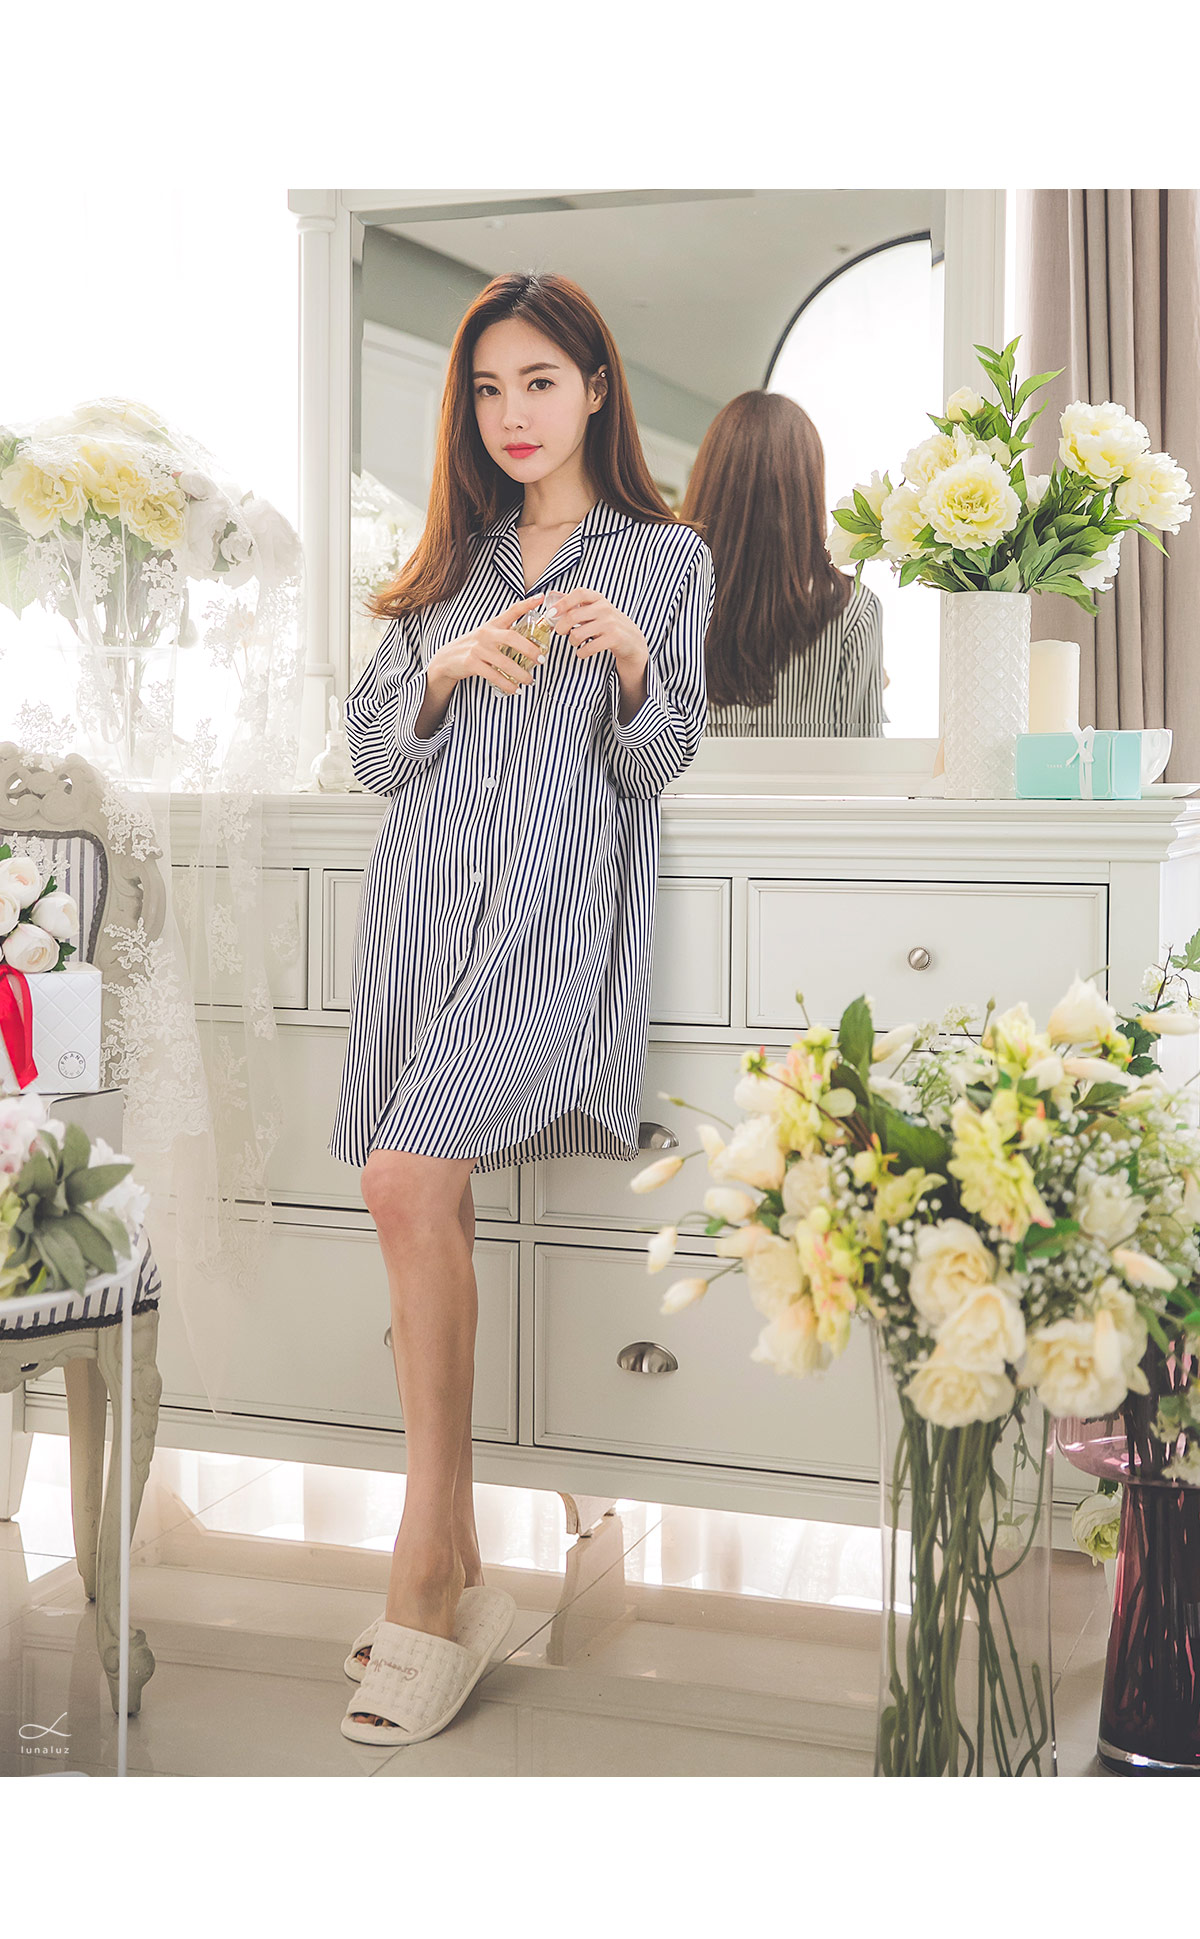 DTY 샤무즈 스트라이프 원피스 여성잠옷 - 쿠비카, 56,000원, 잠옷, 여성파자마